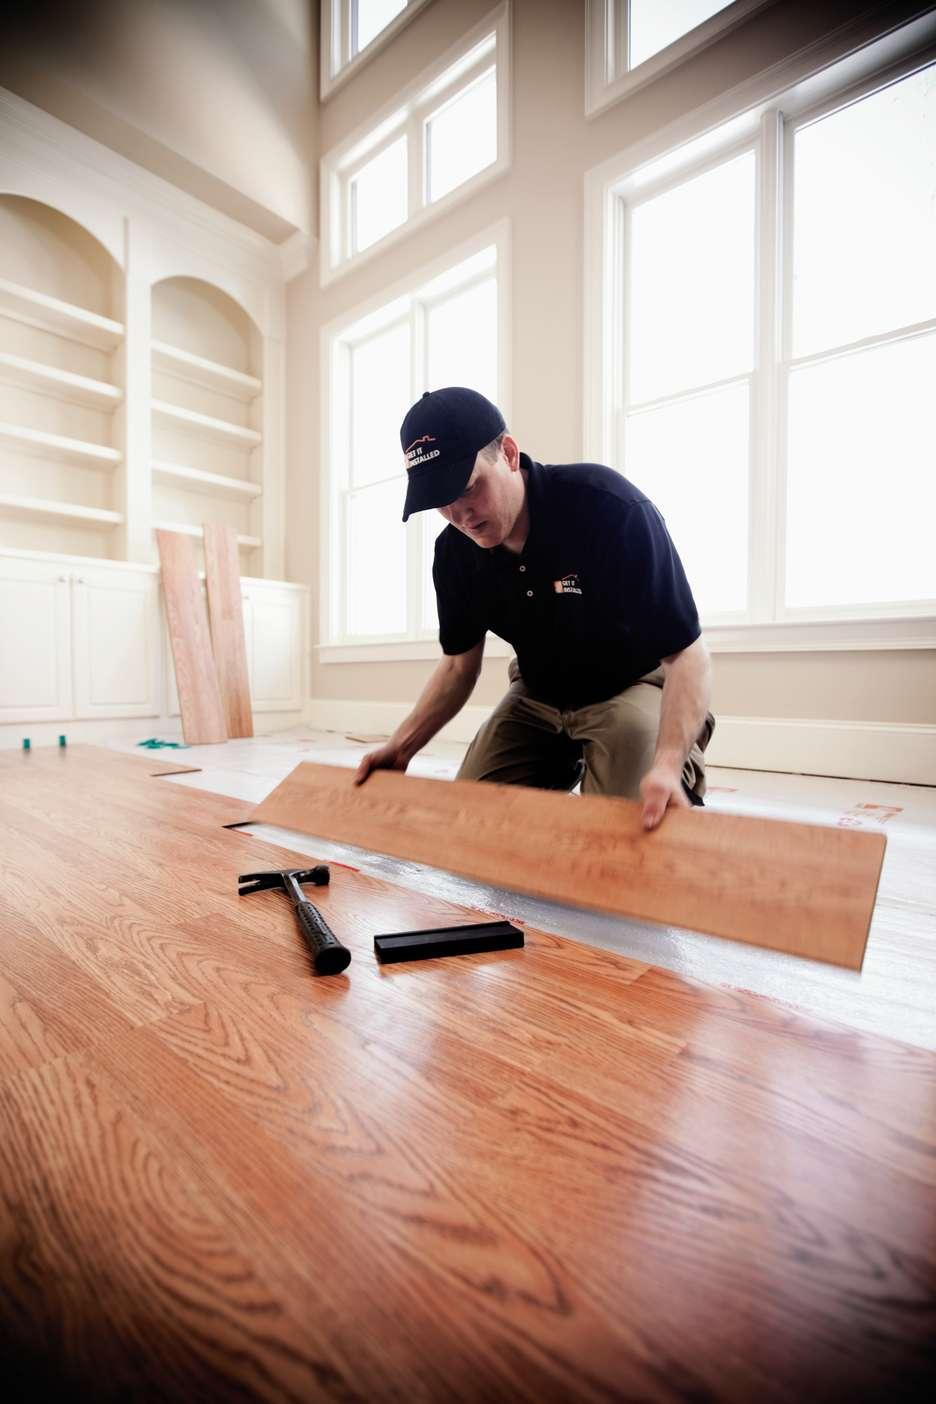 Home Services at The Home Depot - painter  | Photo 9 of 10 | Address: 1551 Dunlawton Blvd, Port Orange, FL 32127, USA | Phone: (386) 361-3452